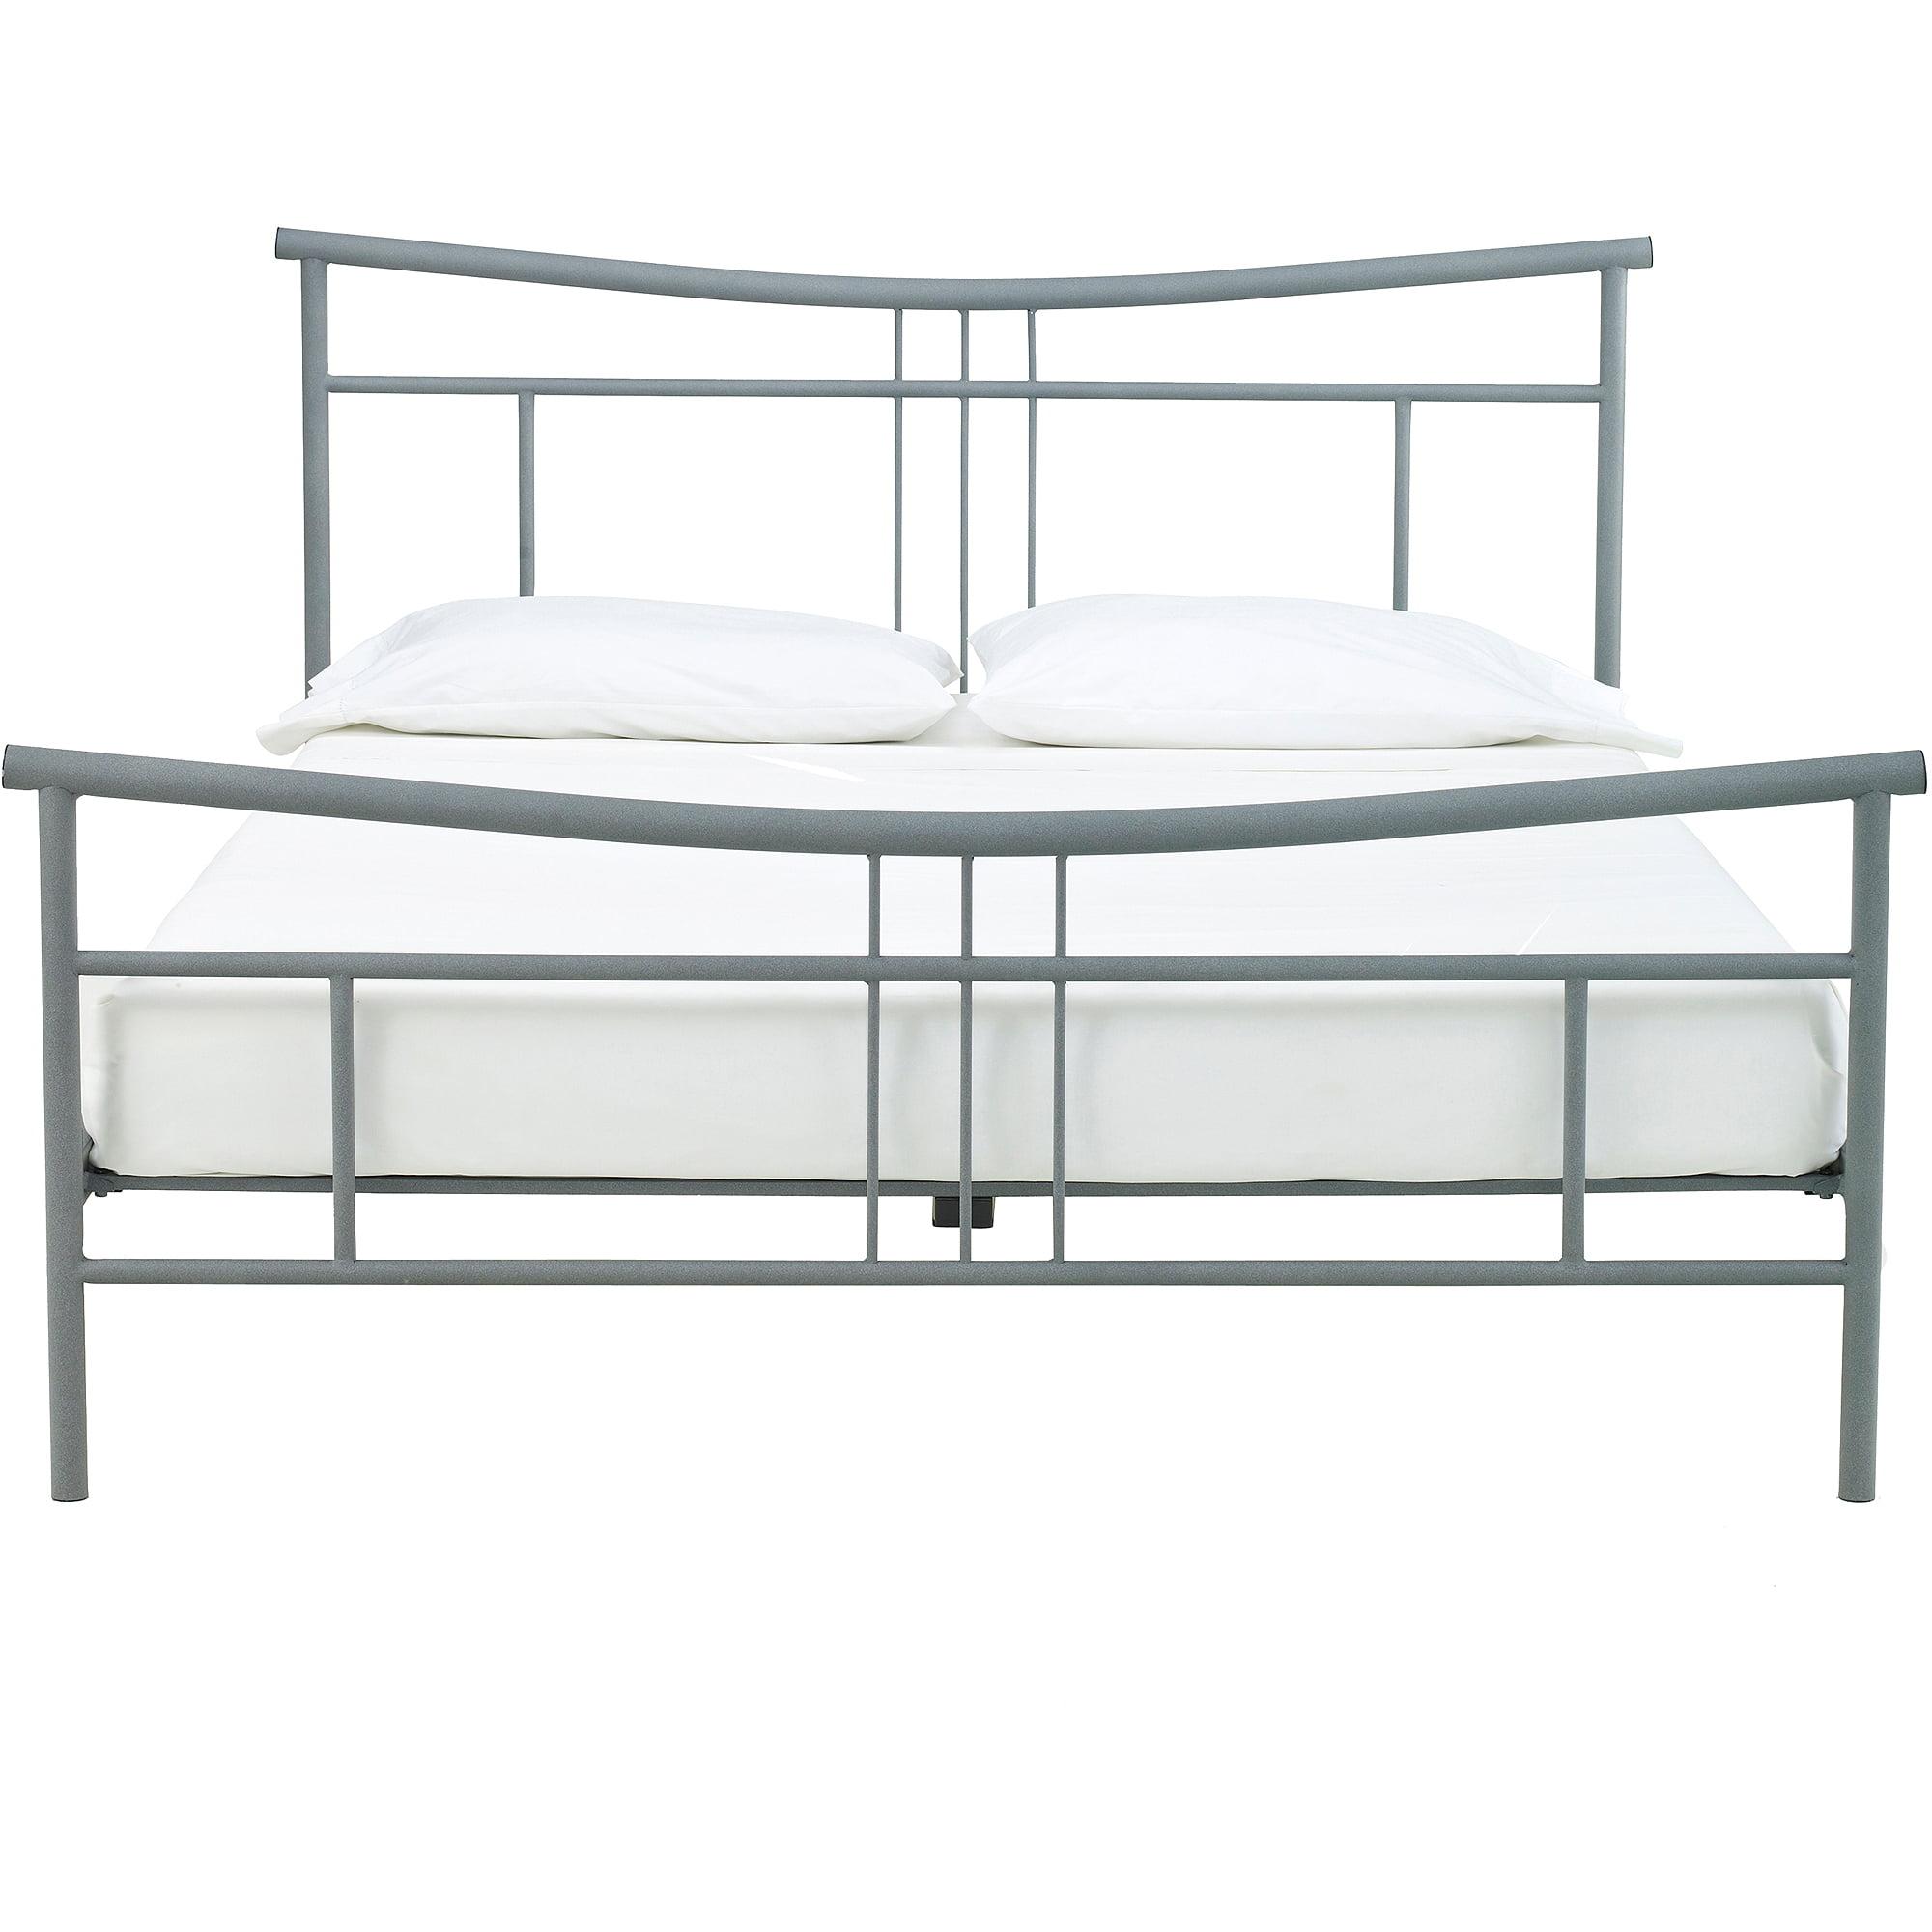 premier annika metal platform bed frame, twin (box 1 of 2